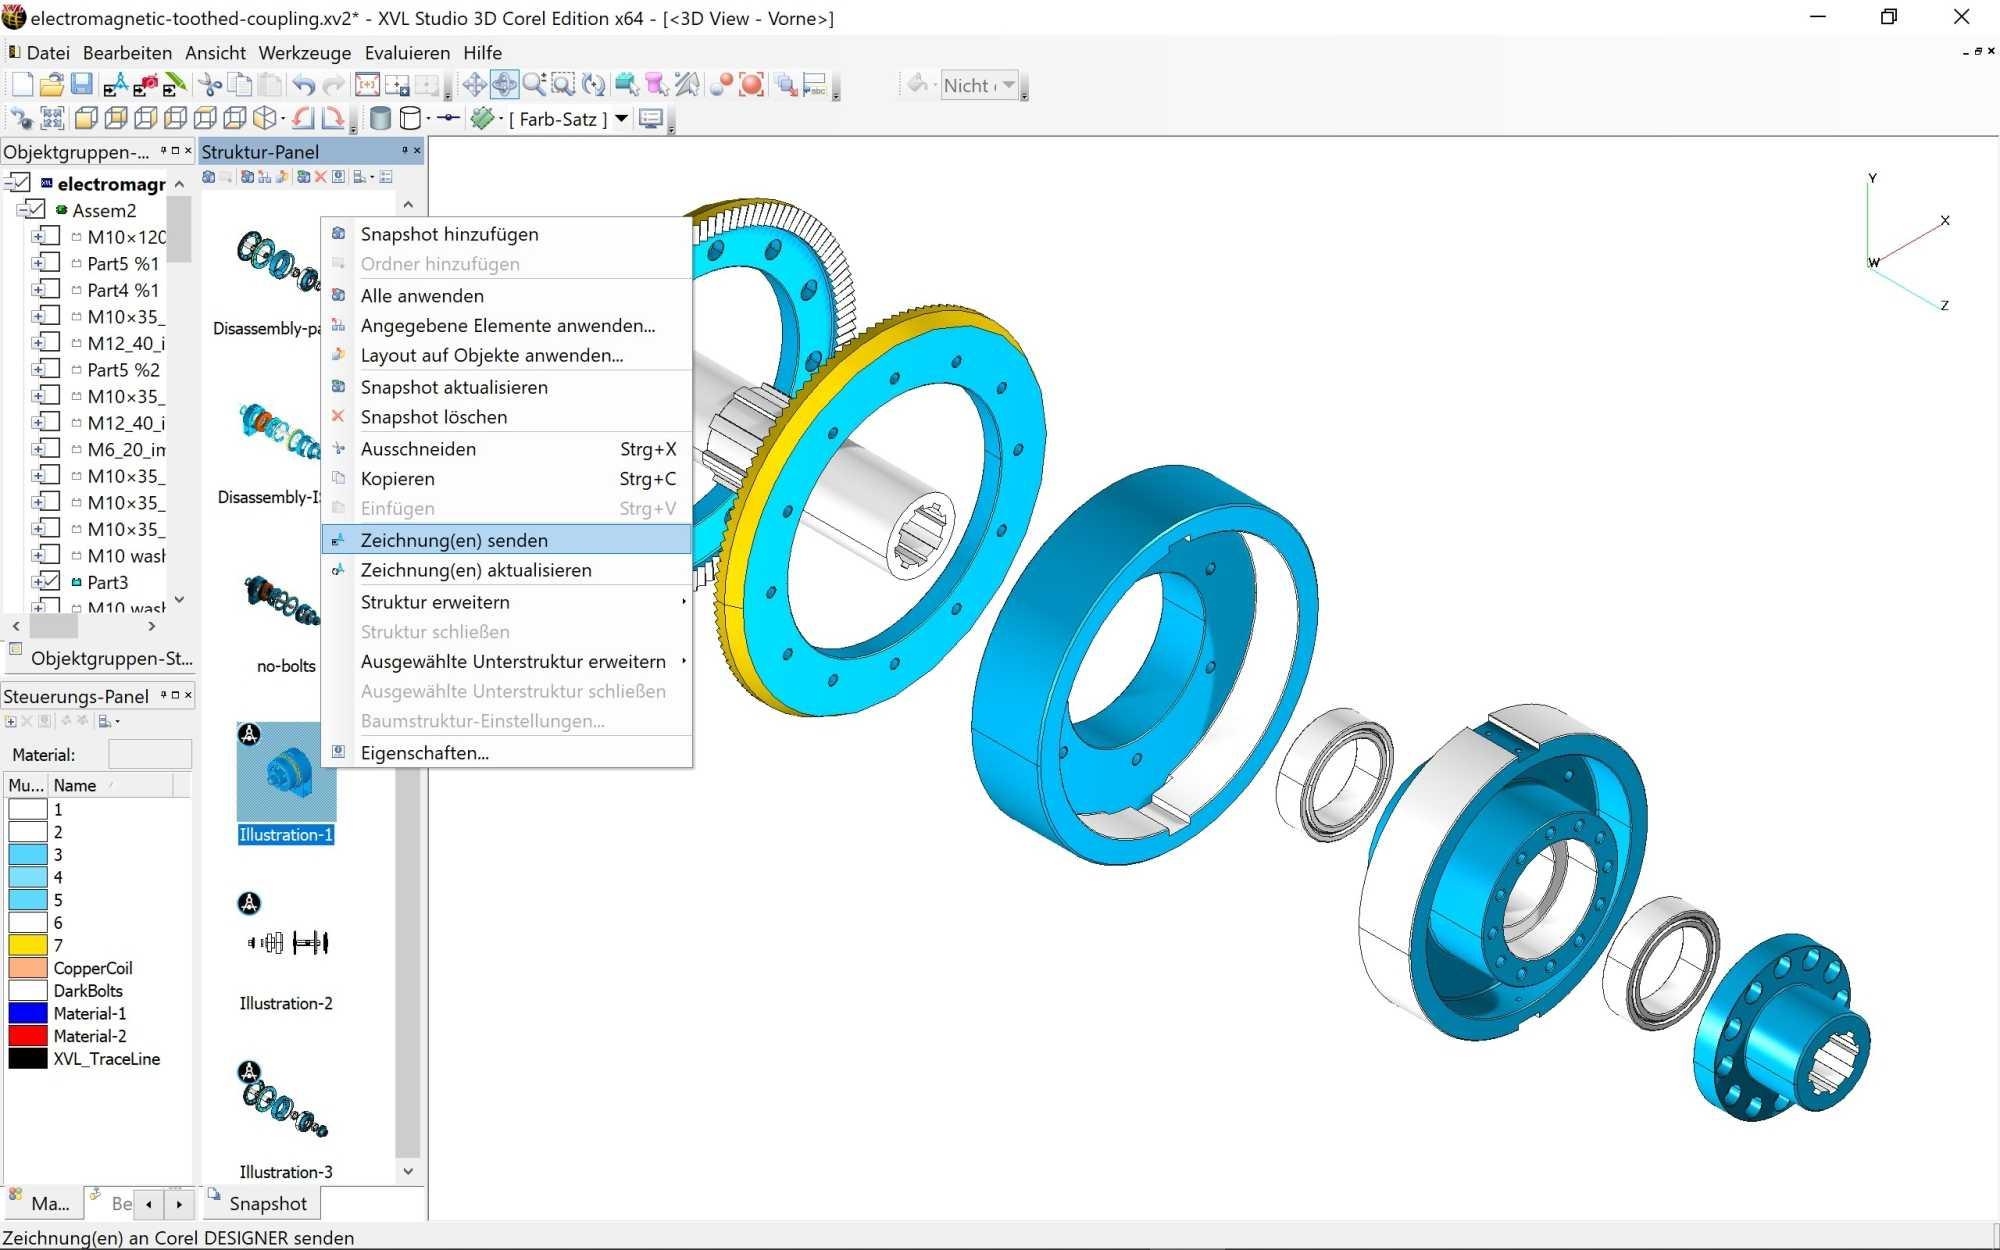 Aus dem XVL Studio 3D CAD Corel Edition lassen sich 3D-Ansichten als Vektorgrafik in den Designer exportieren.